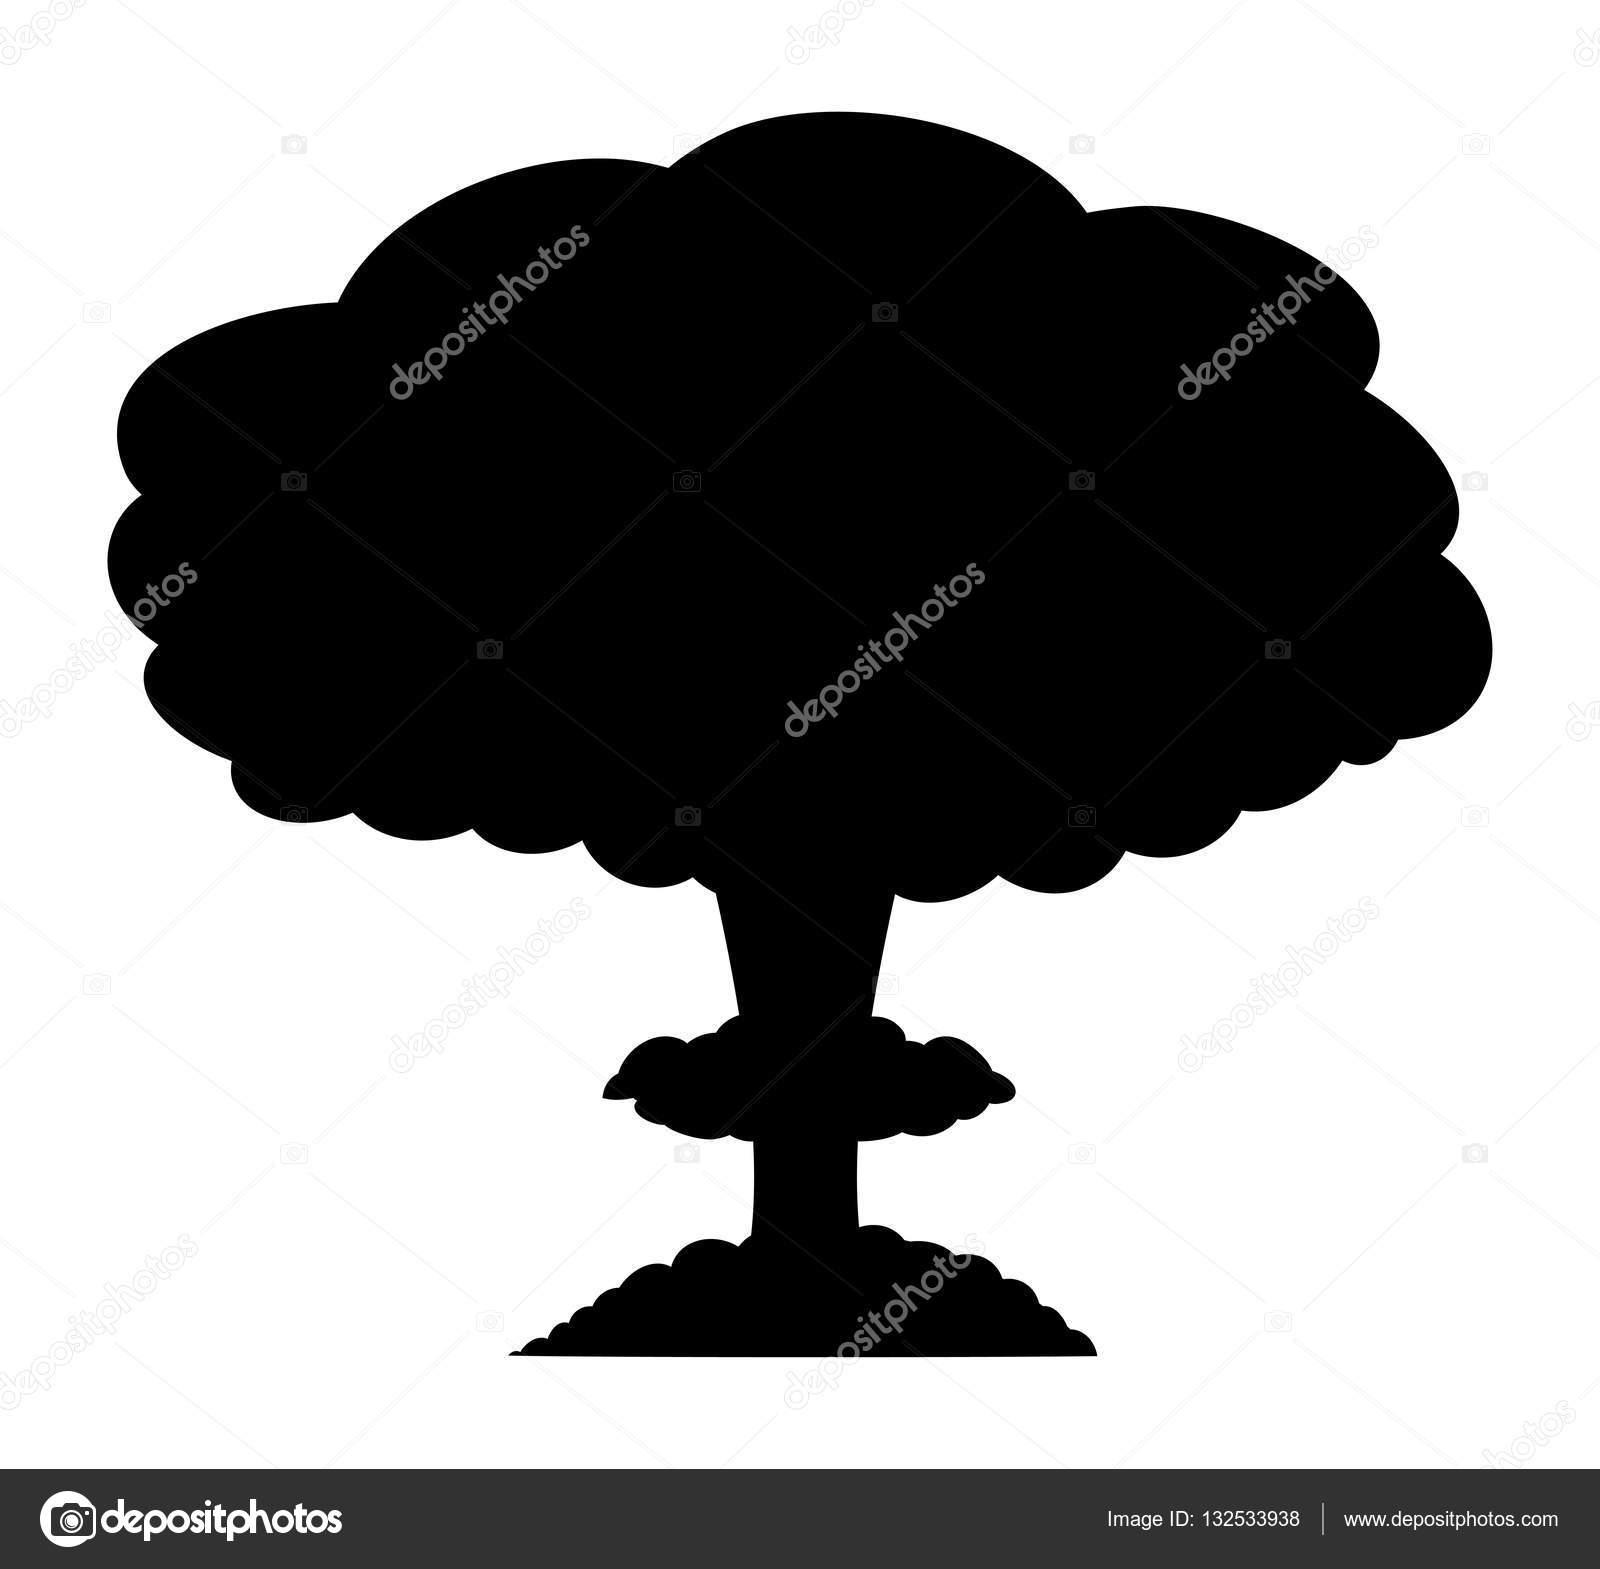 Depositphotos Stock Illustration Mushroom Cloud Nuclear Explosion Silhouette